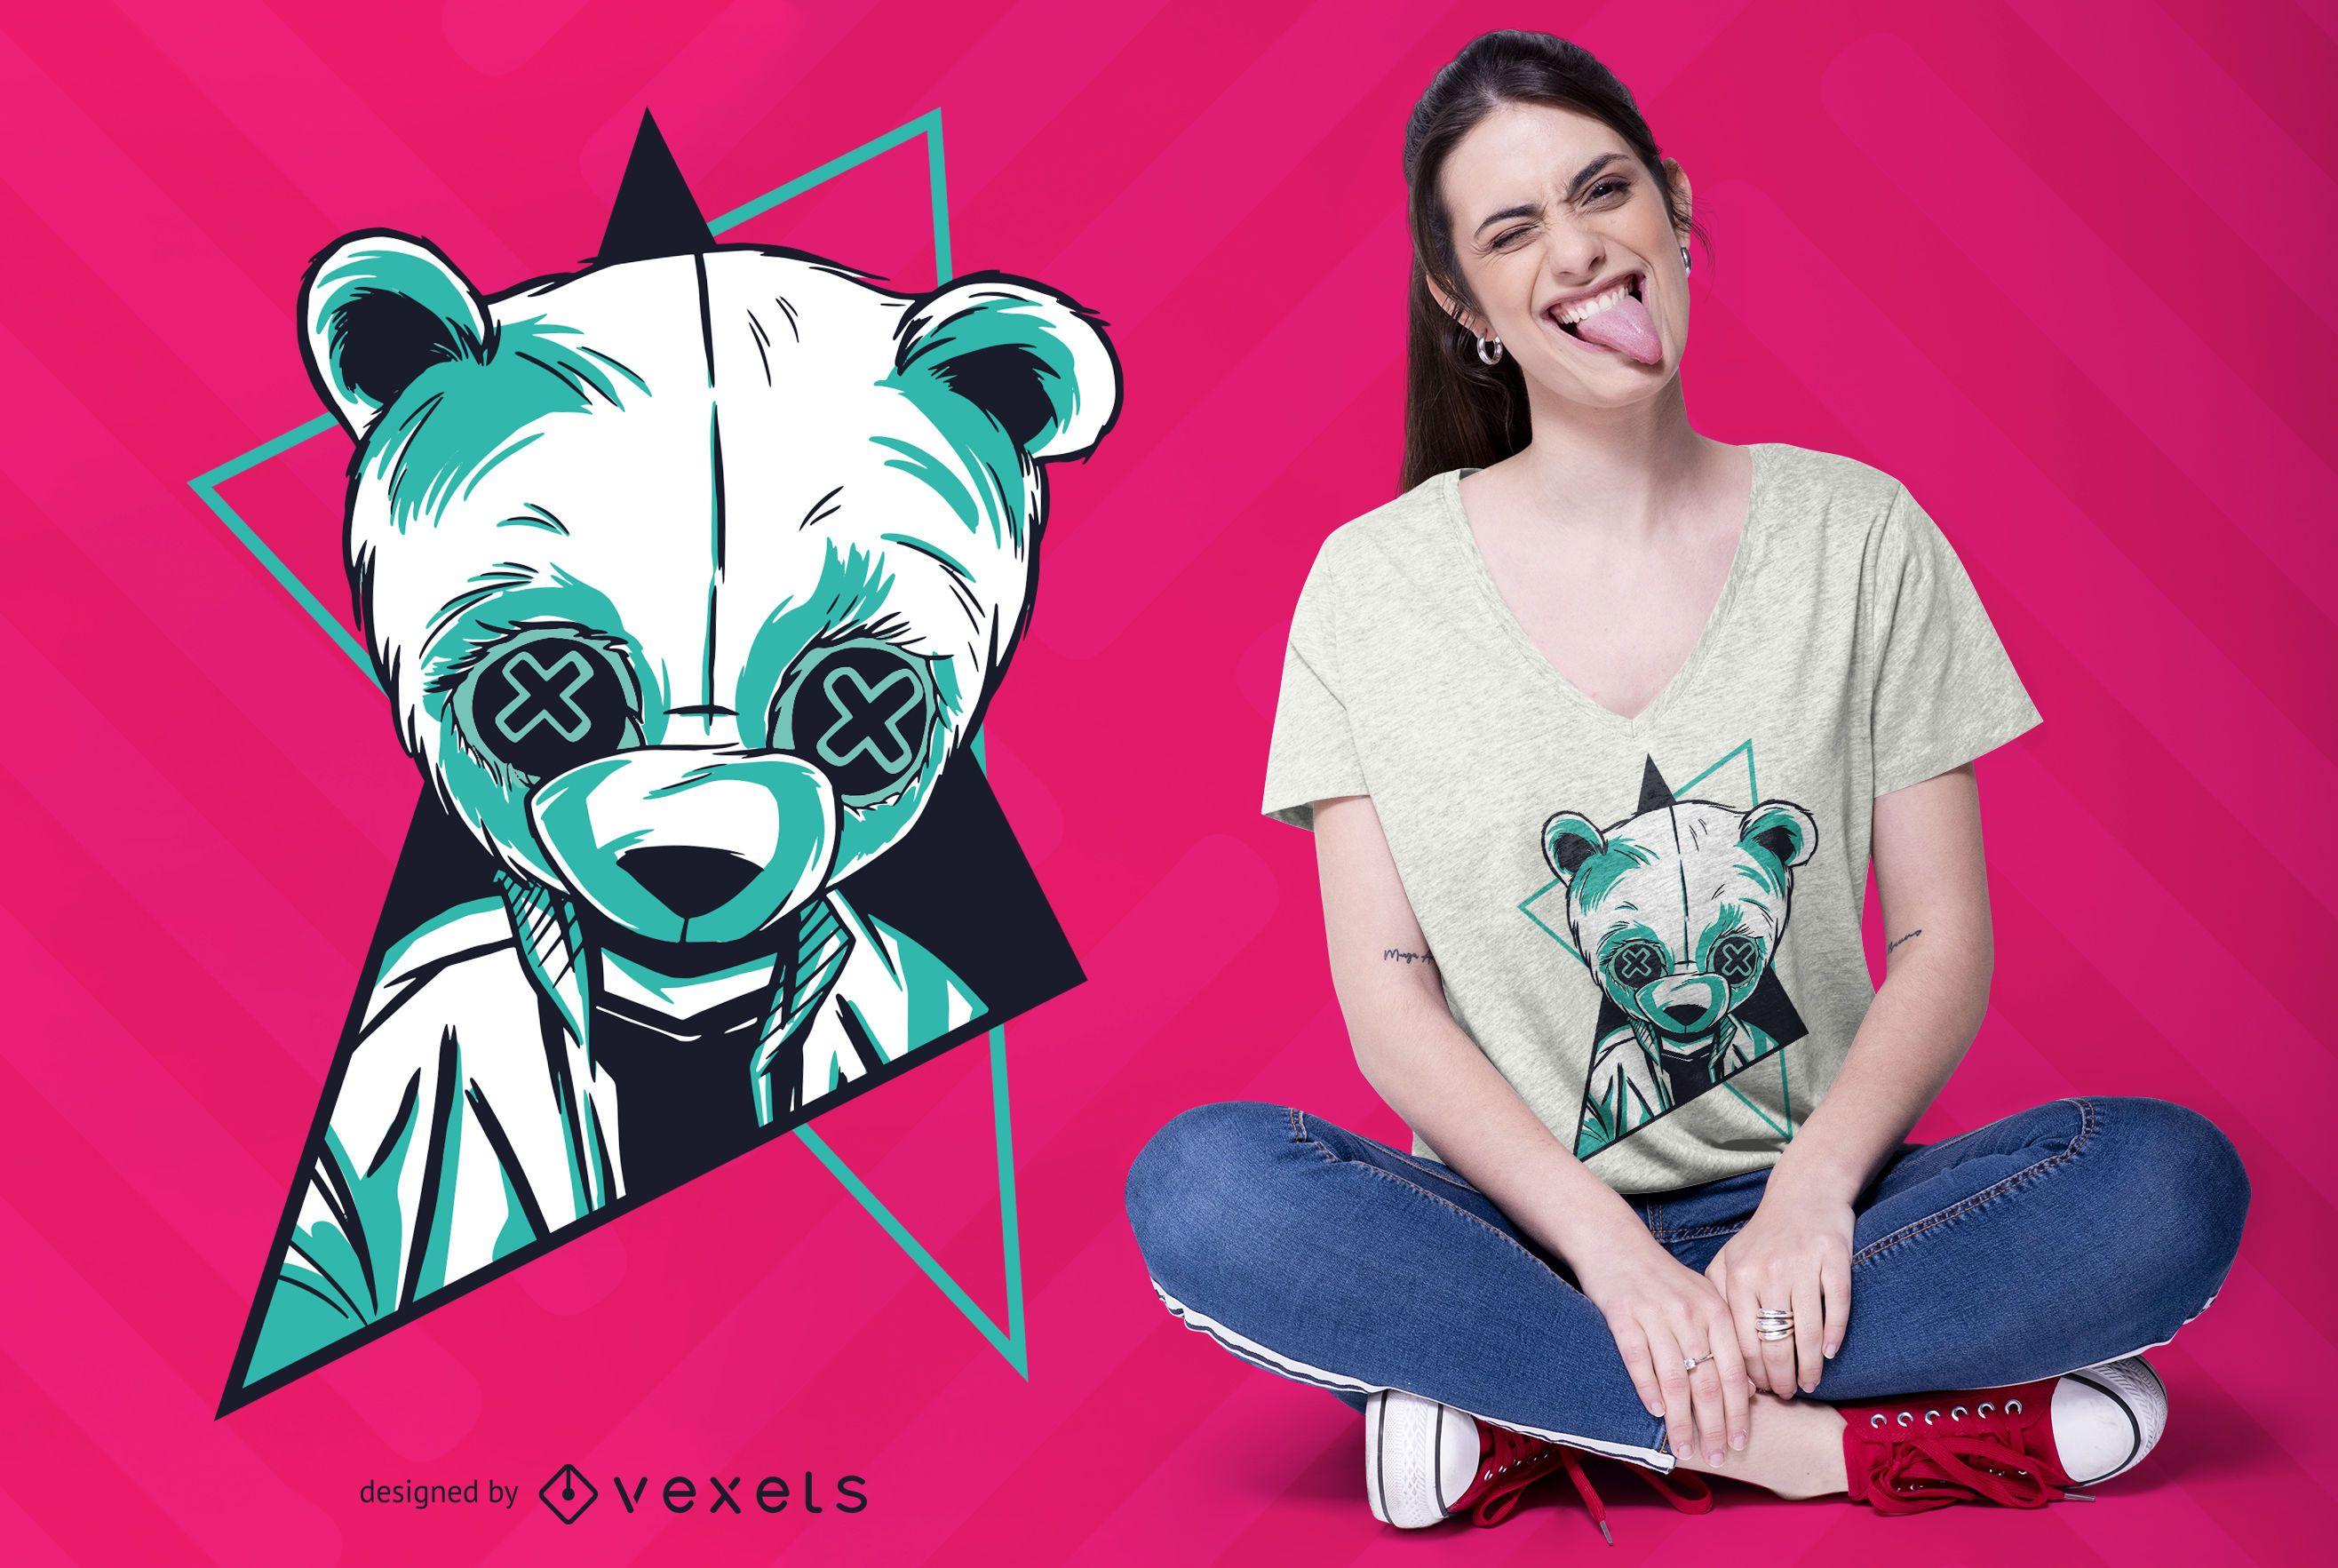 Neon panda t-shirt design